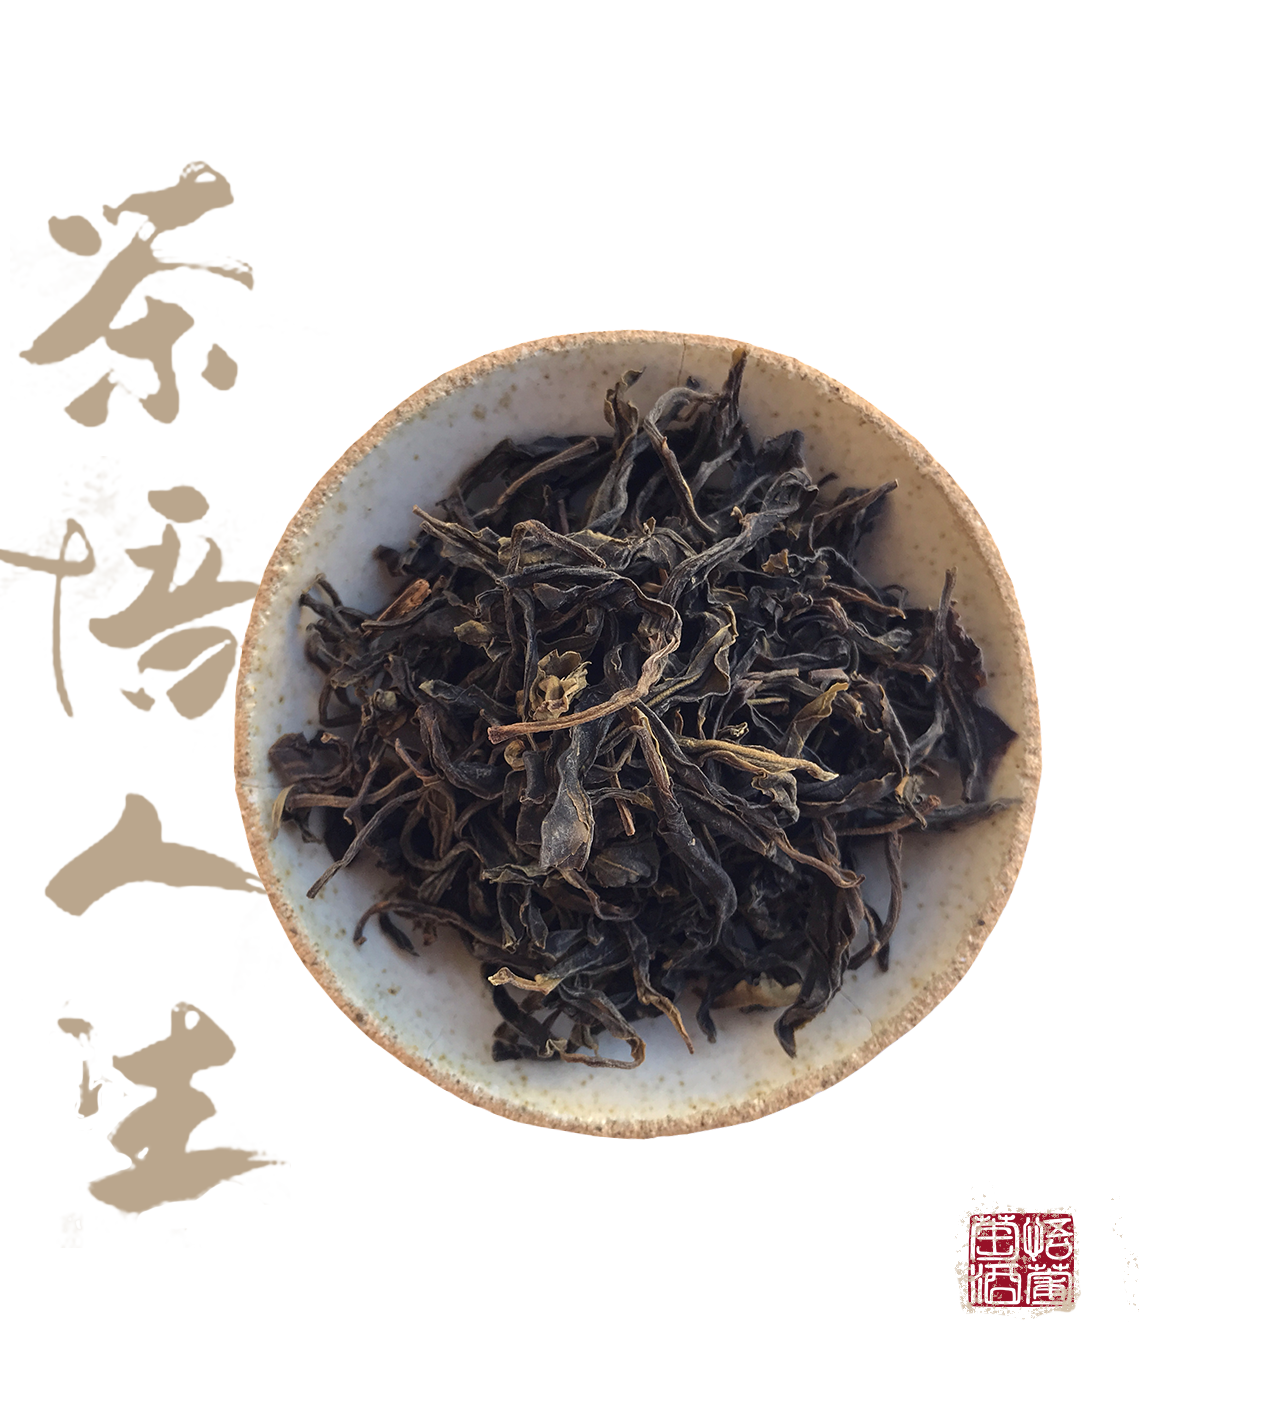 Feng qing vieux abres is a sheng raw pu erh from yunnan